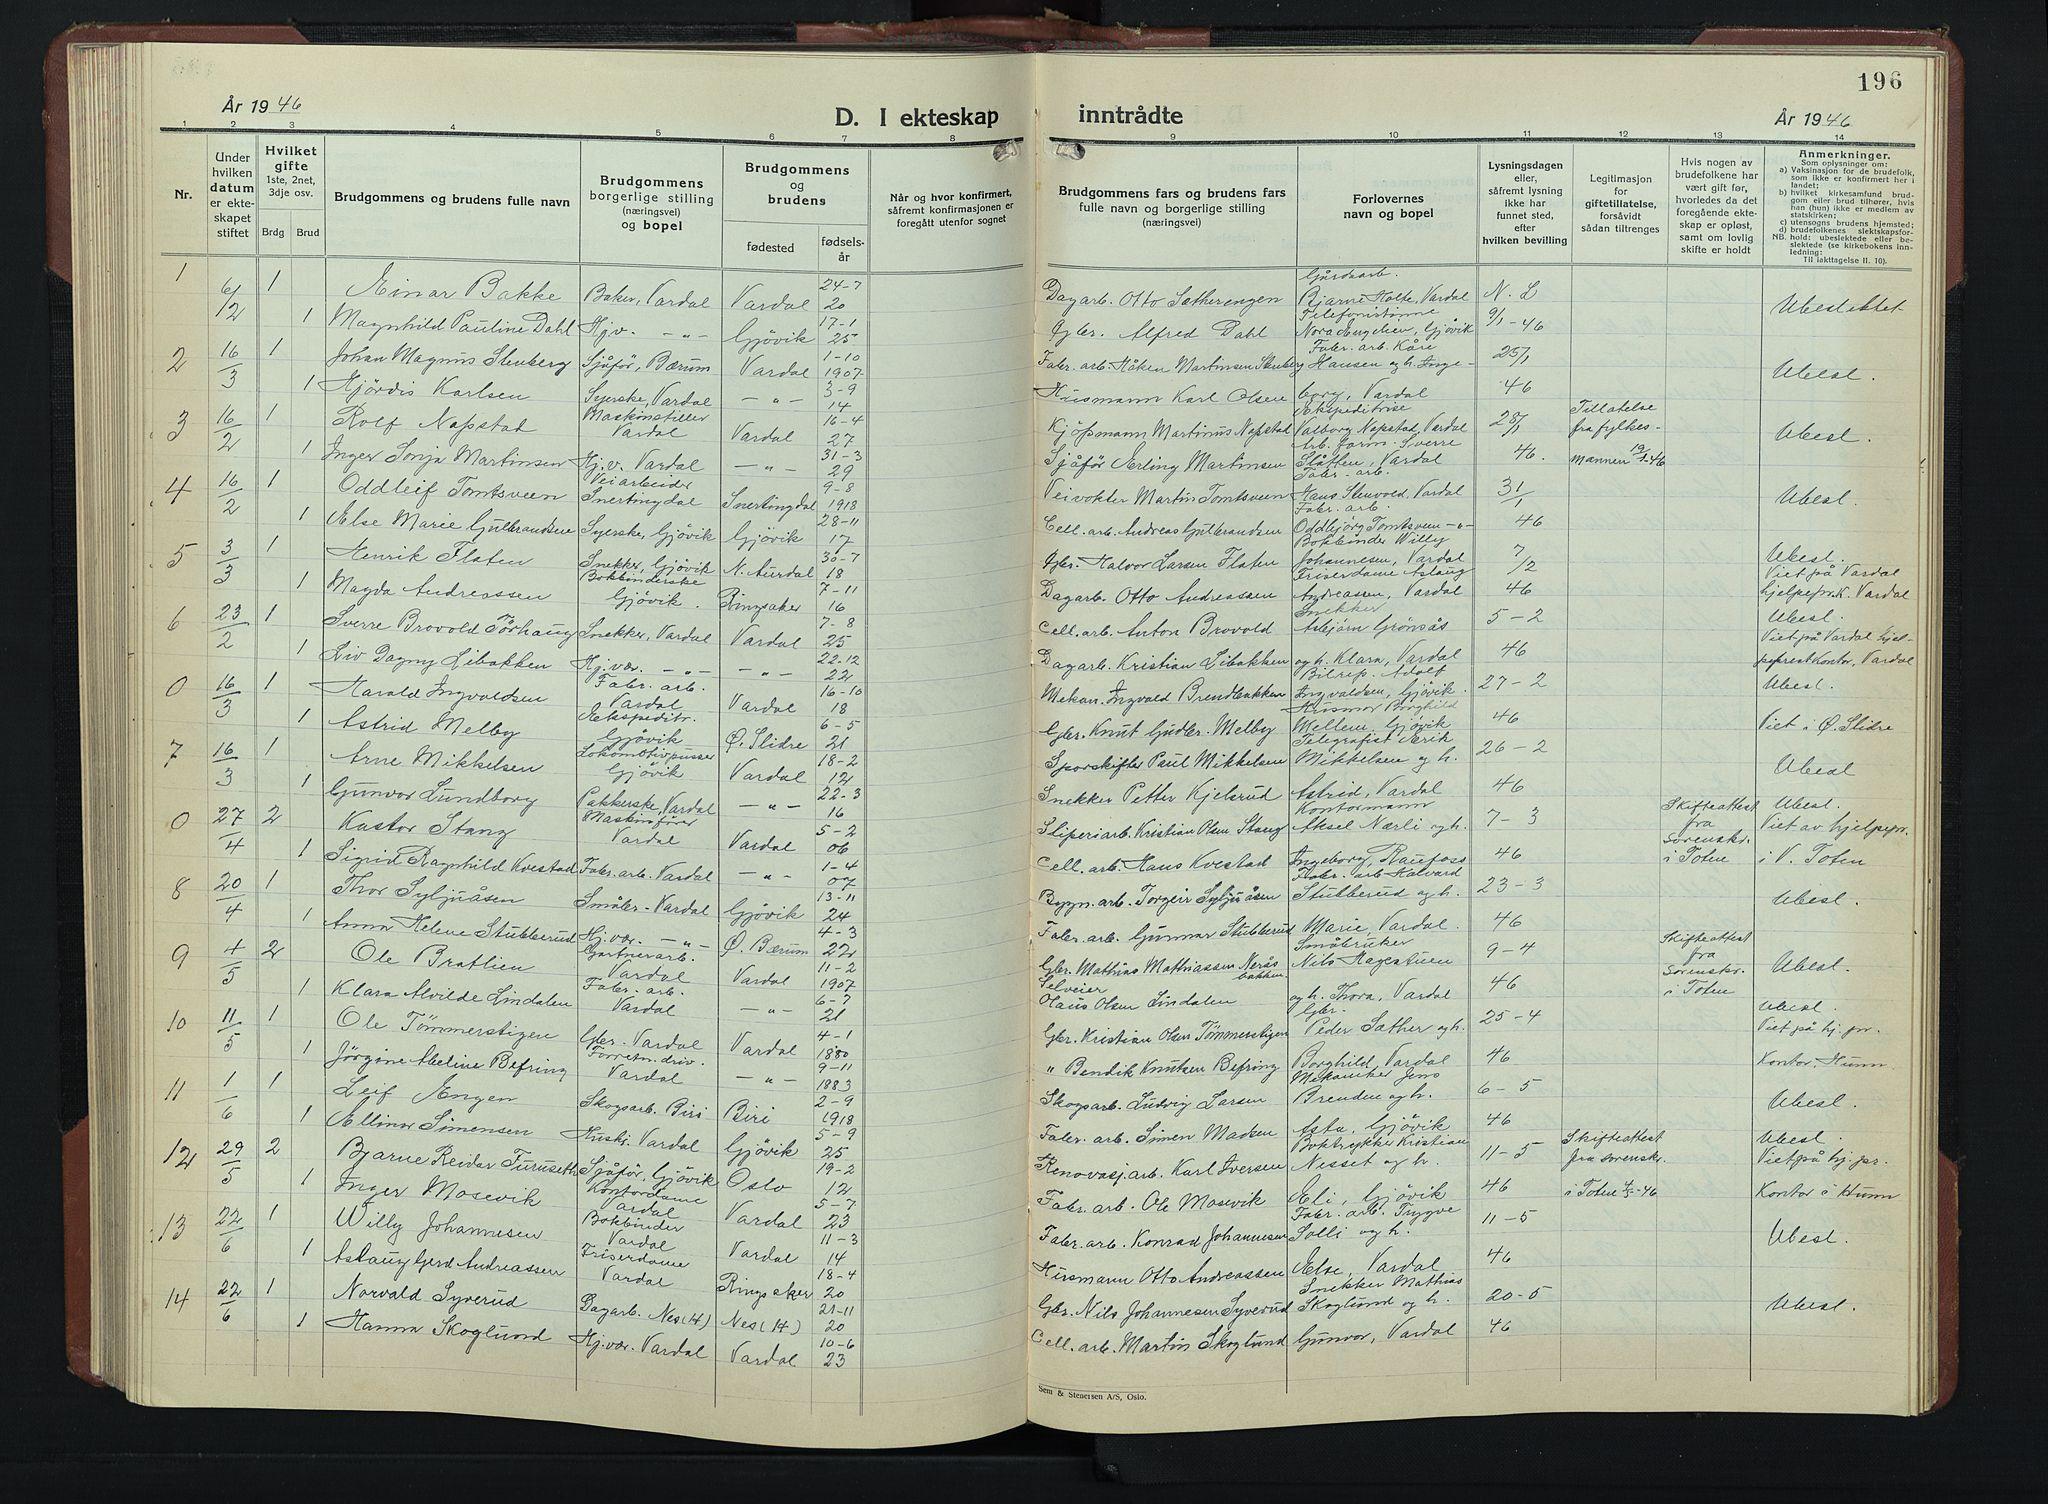 SAH, Vardal prestekontor, H/Ha/Hab/L0019: Klokkerbok nr. 19, 1941-1951, s. 196